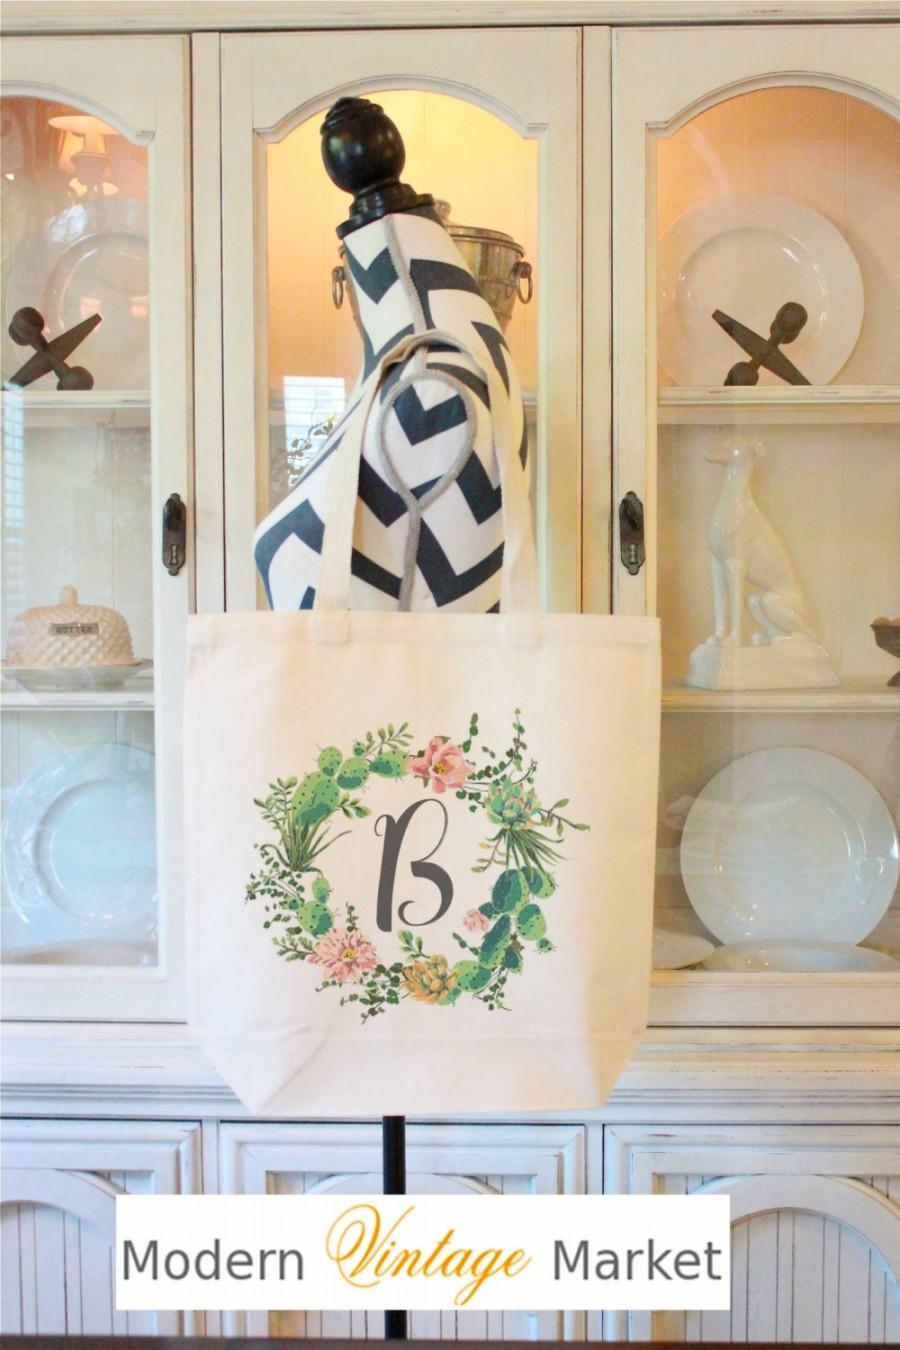 Свадьба - Succulent Wreath Tote,Rustic Wedding Bags,Cactus Wedding,Bridesmaid Bags,Bridesmaid Tote Bags,Gift bags,Bridesmaid bag,Modern Vintage Market